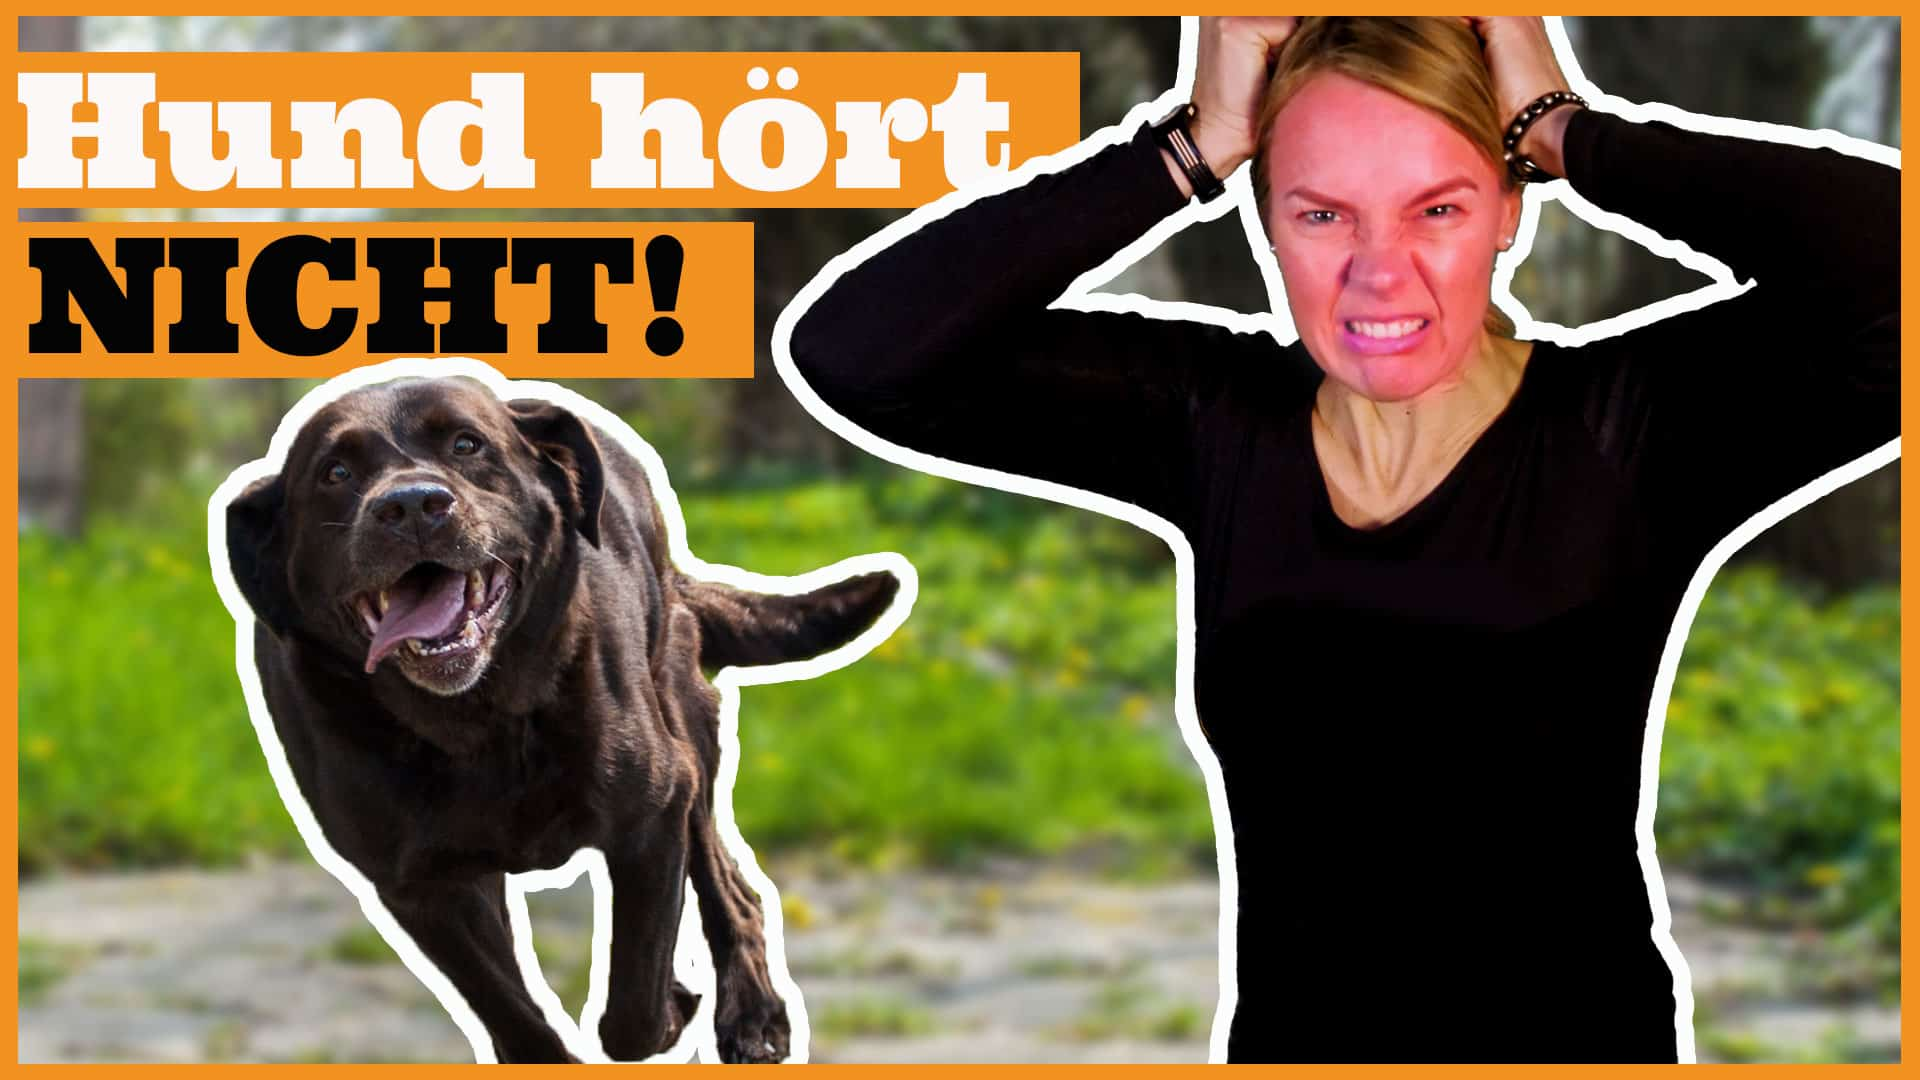 hund hört nicht dogstv